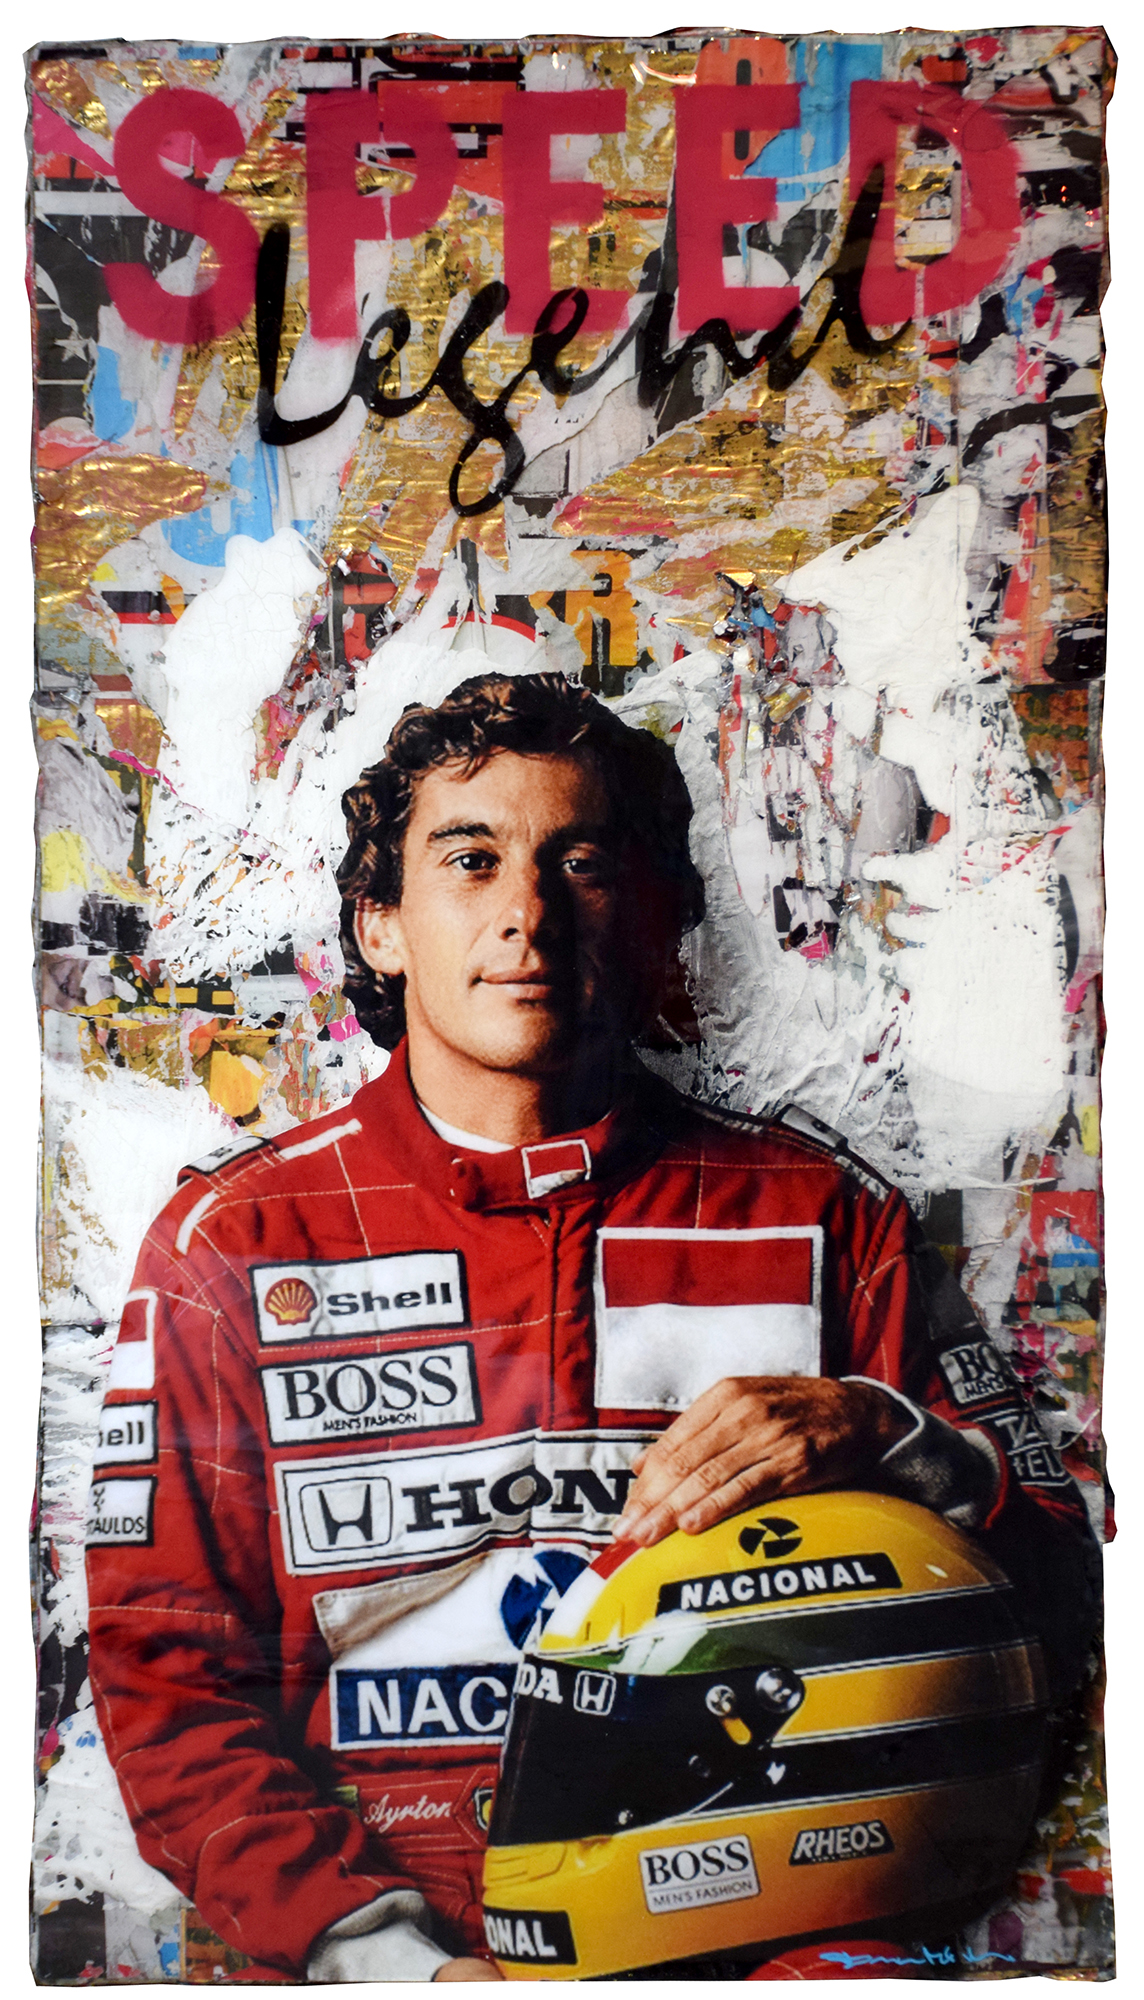 Bram Reijnders - Senna , 8031-012-046